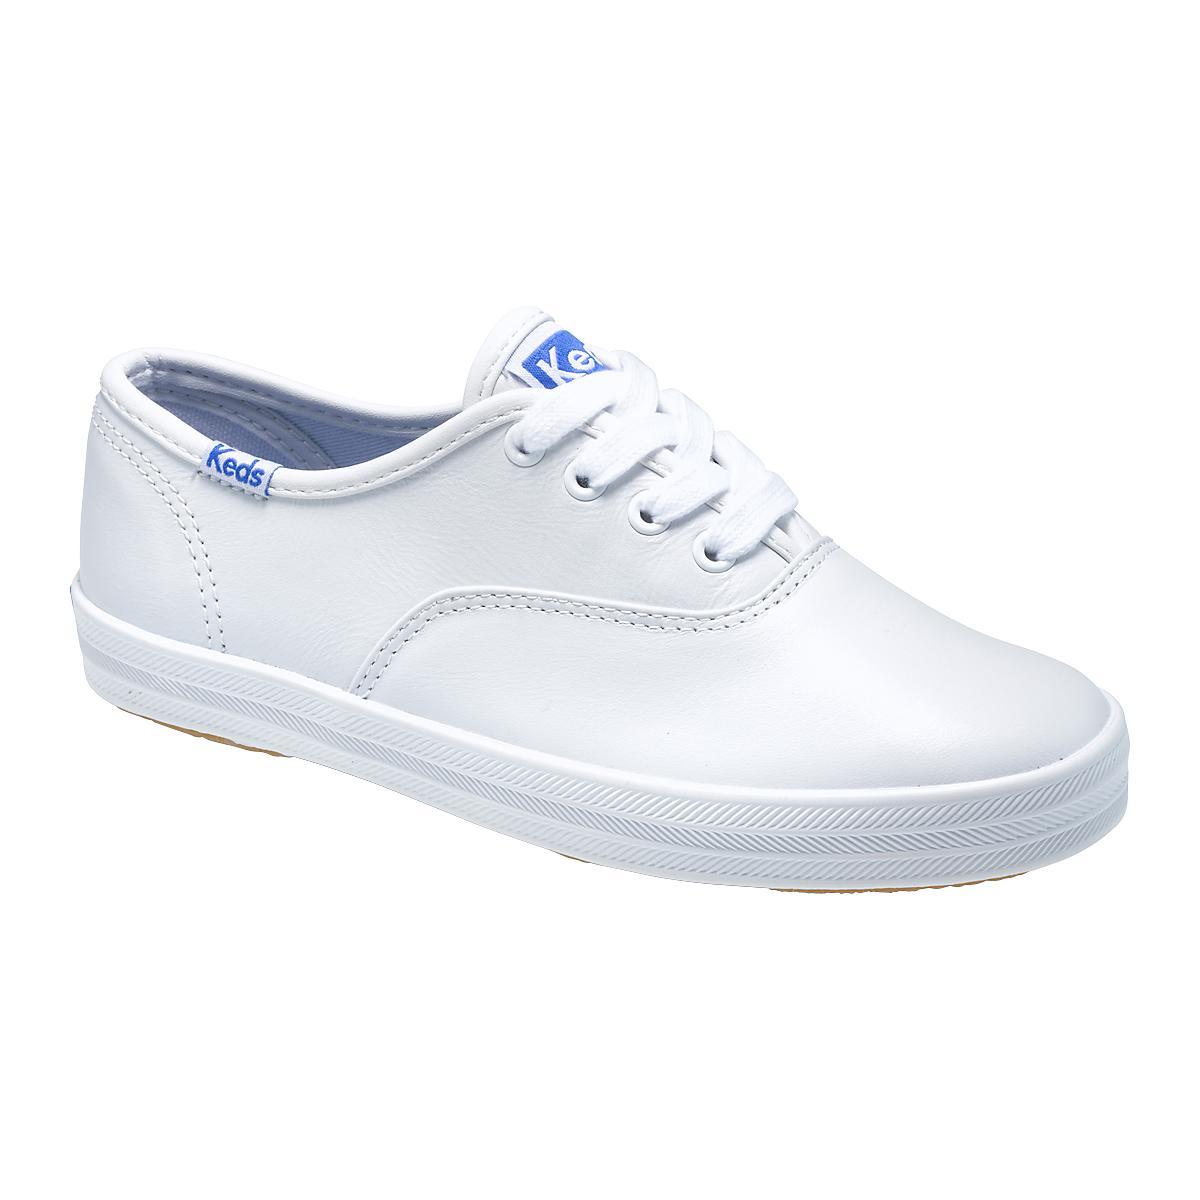 5791d52bc51915 Kids Keds Original Champion CVO Classic Casual Shoe